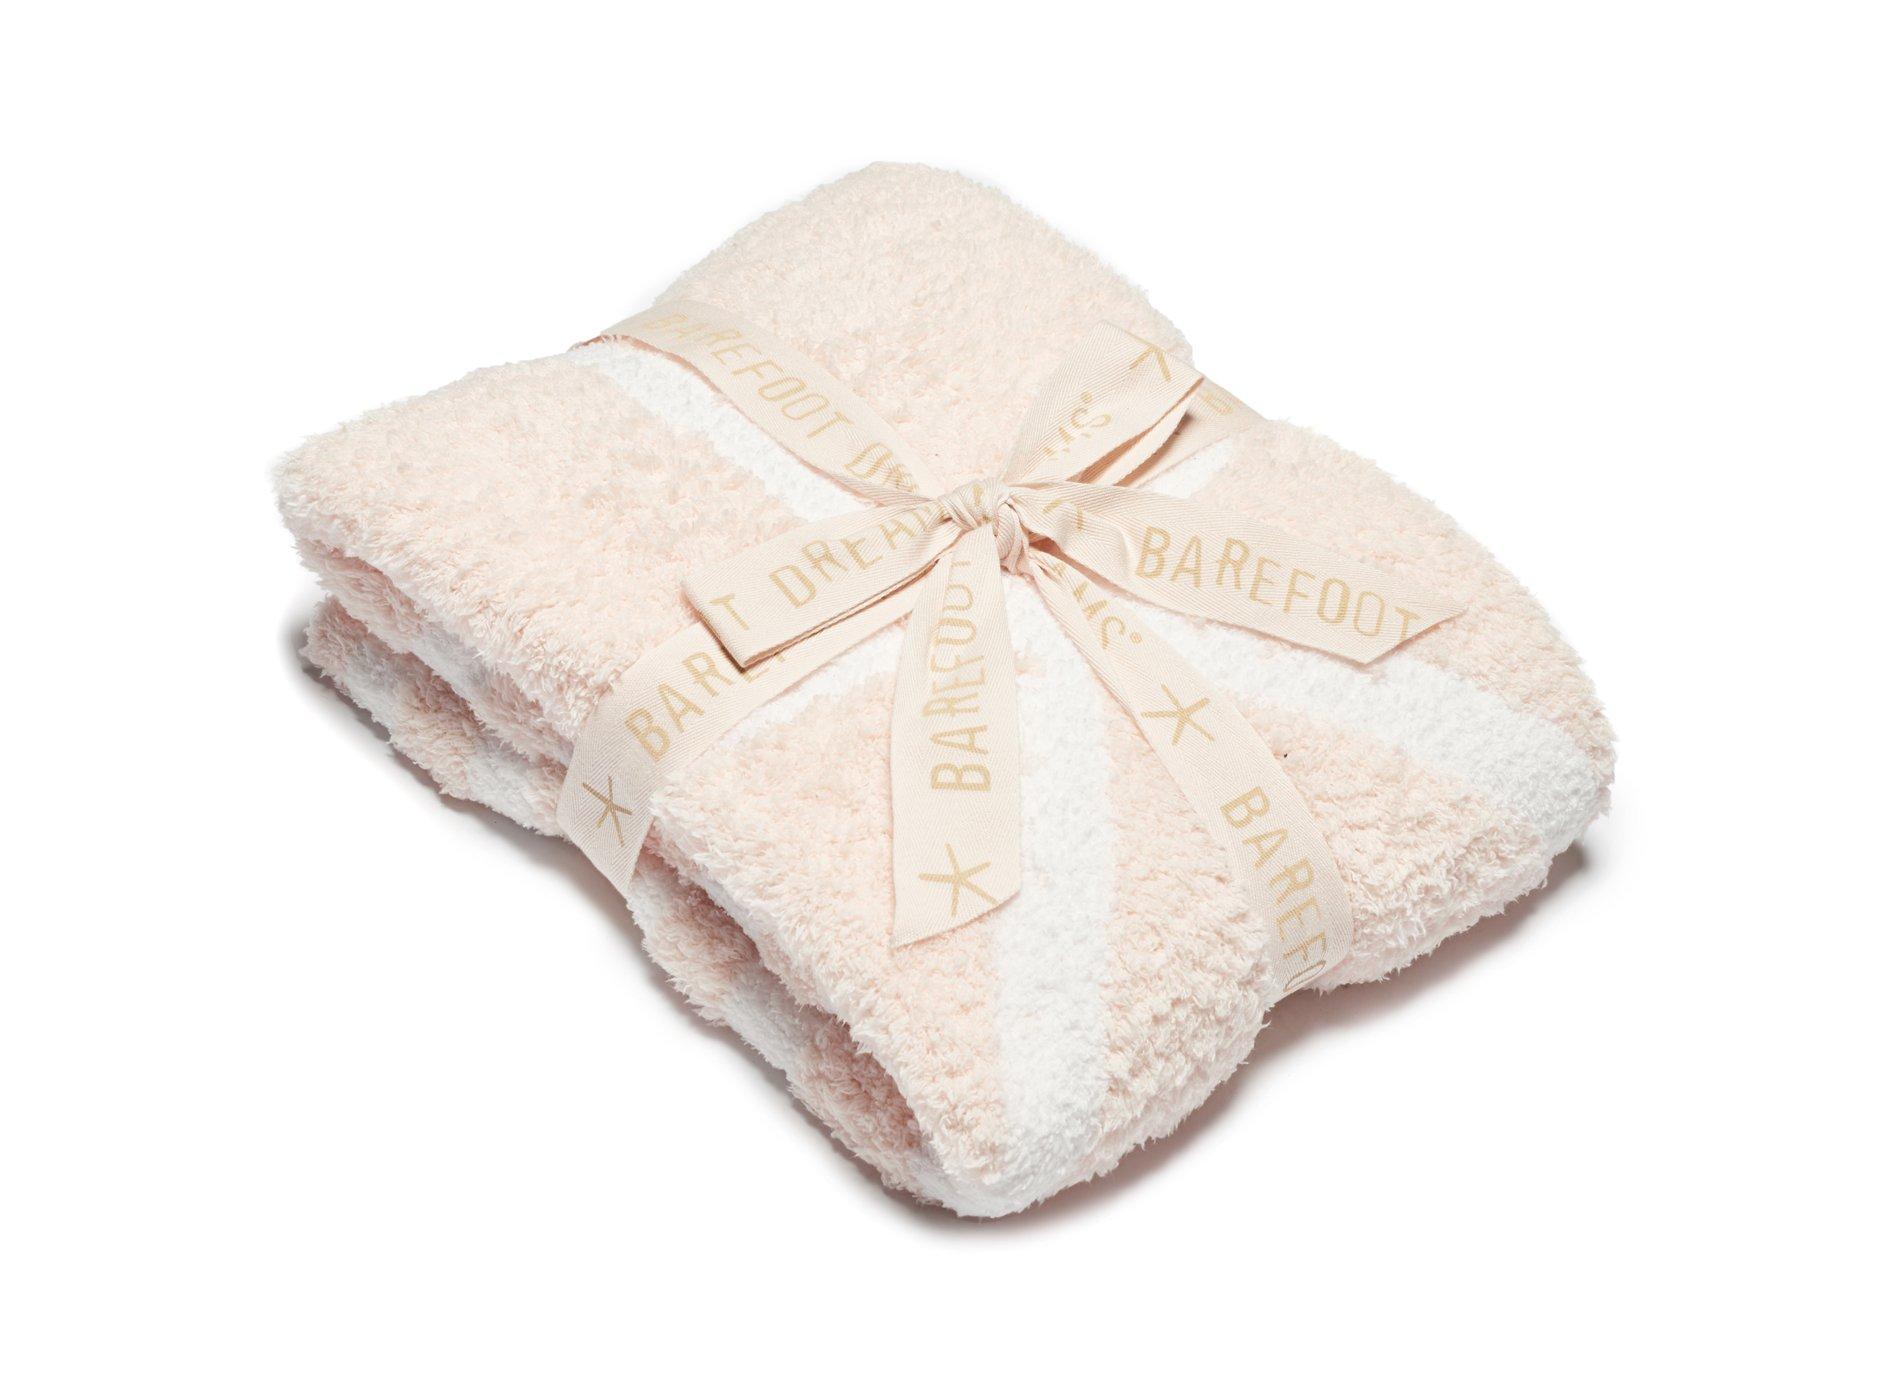 Barefoot Dreams CozyChic Starfish Blanket, Sunrise Pink/White